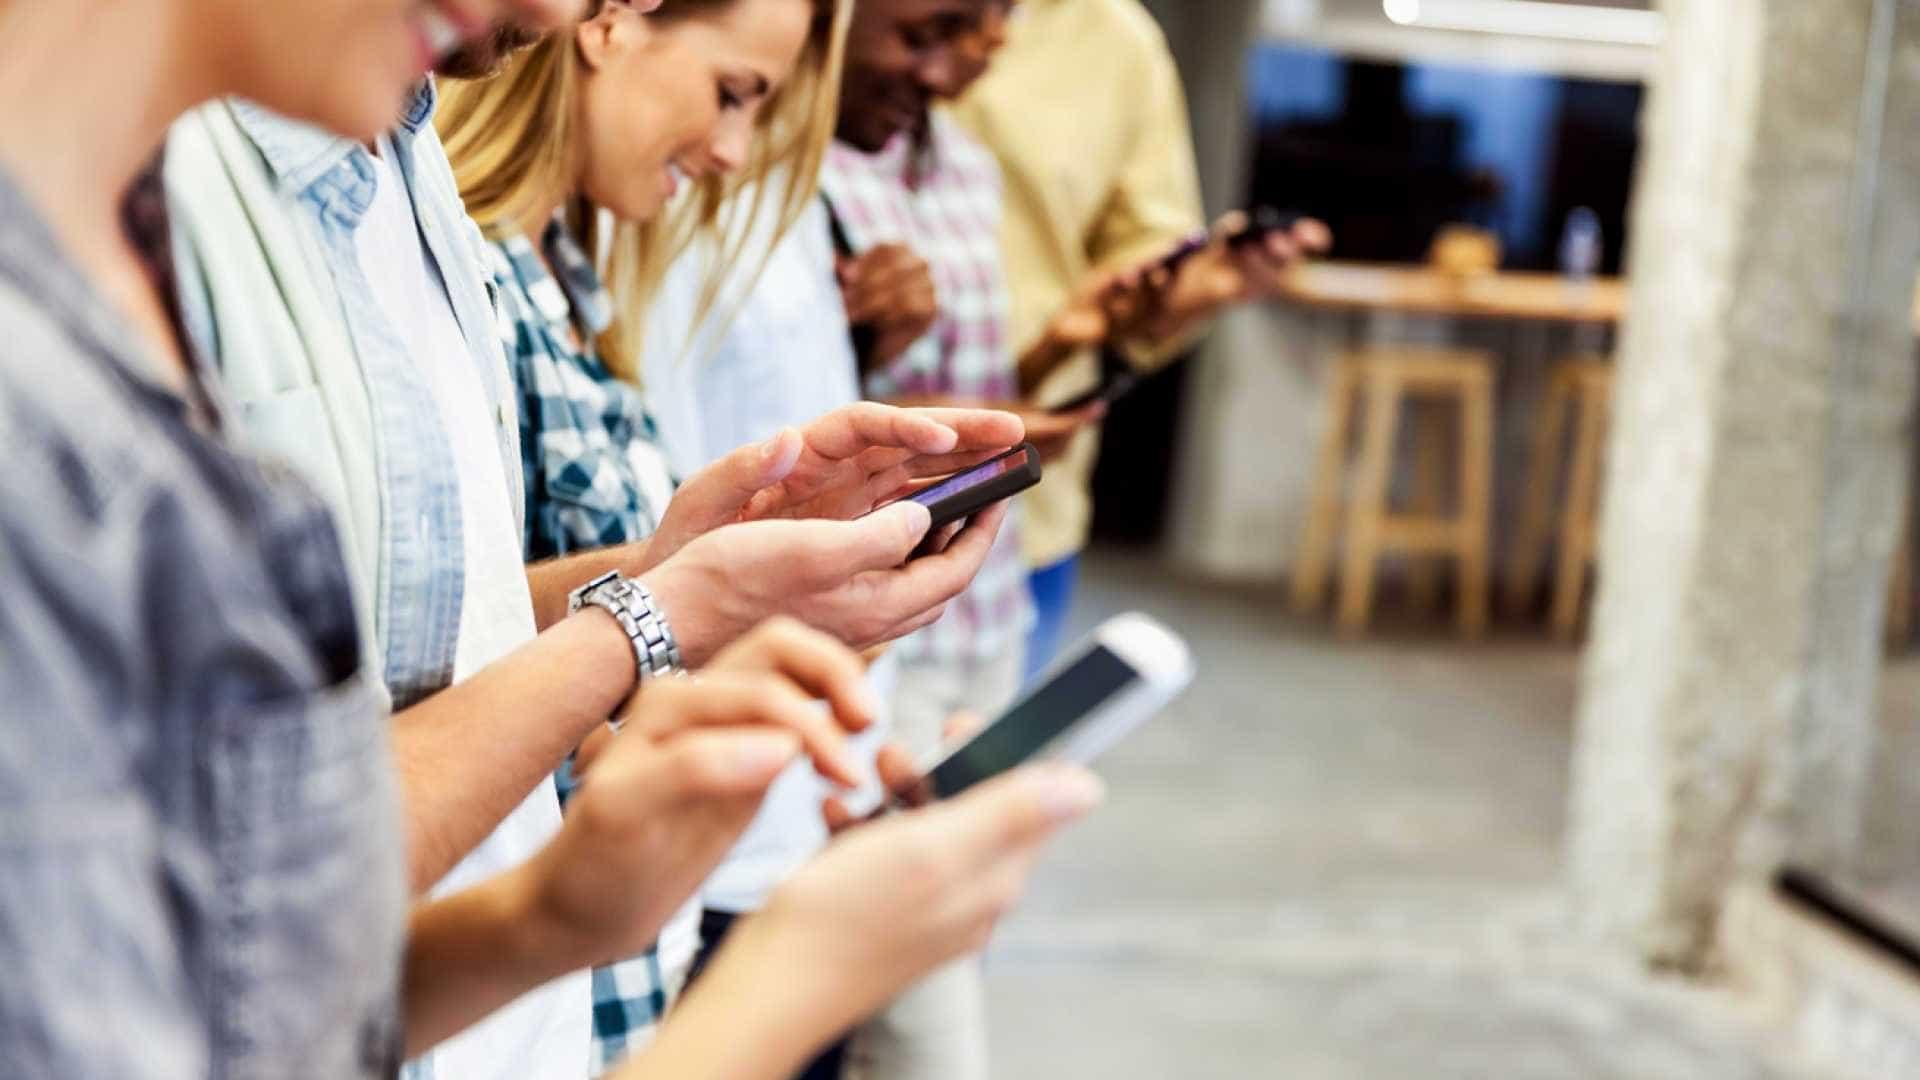 Dicas para o primeiro encontro na era dos apps de namoro